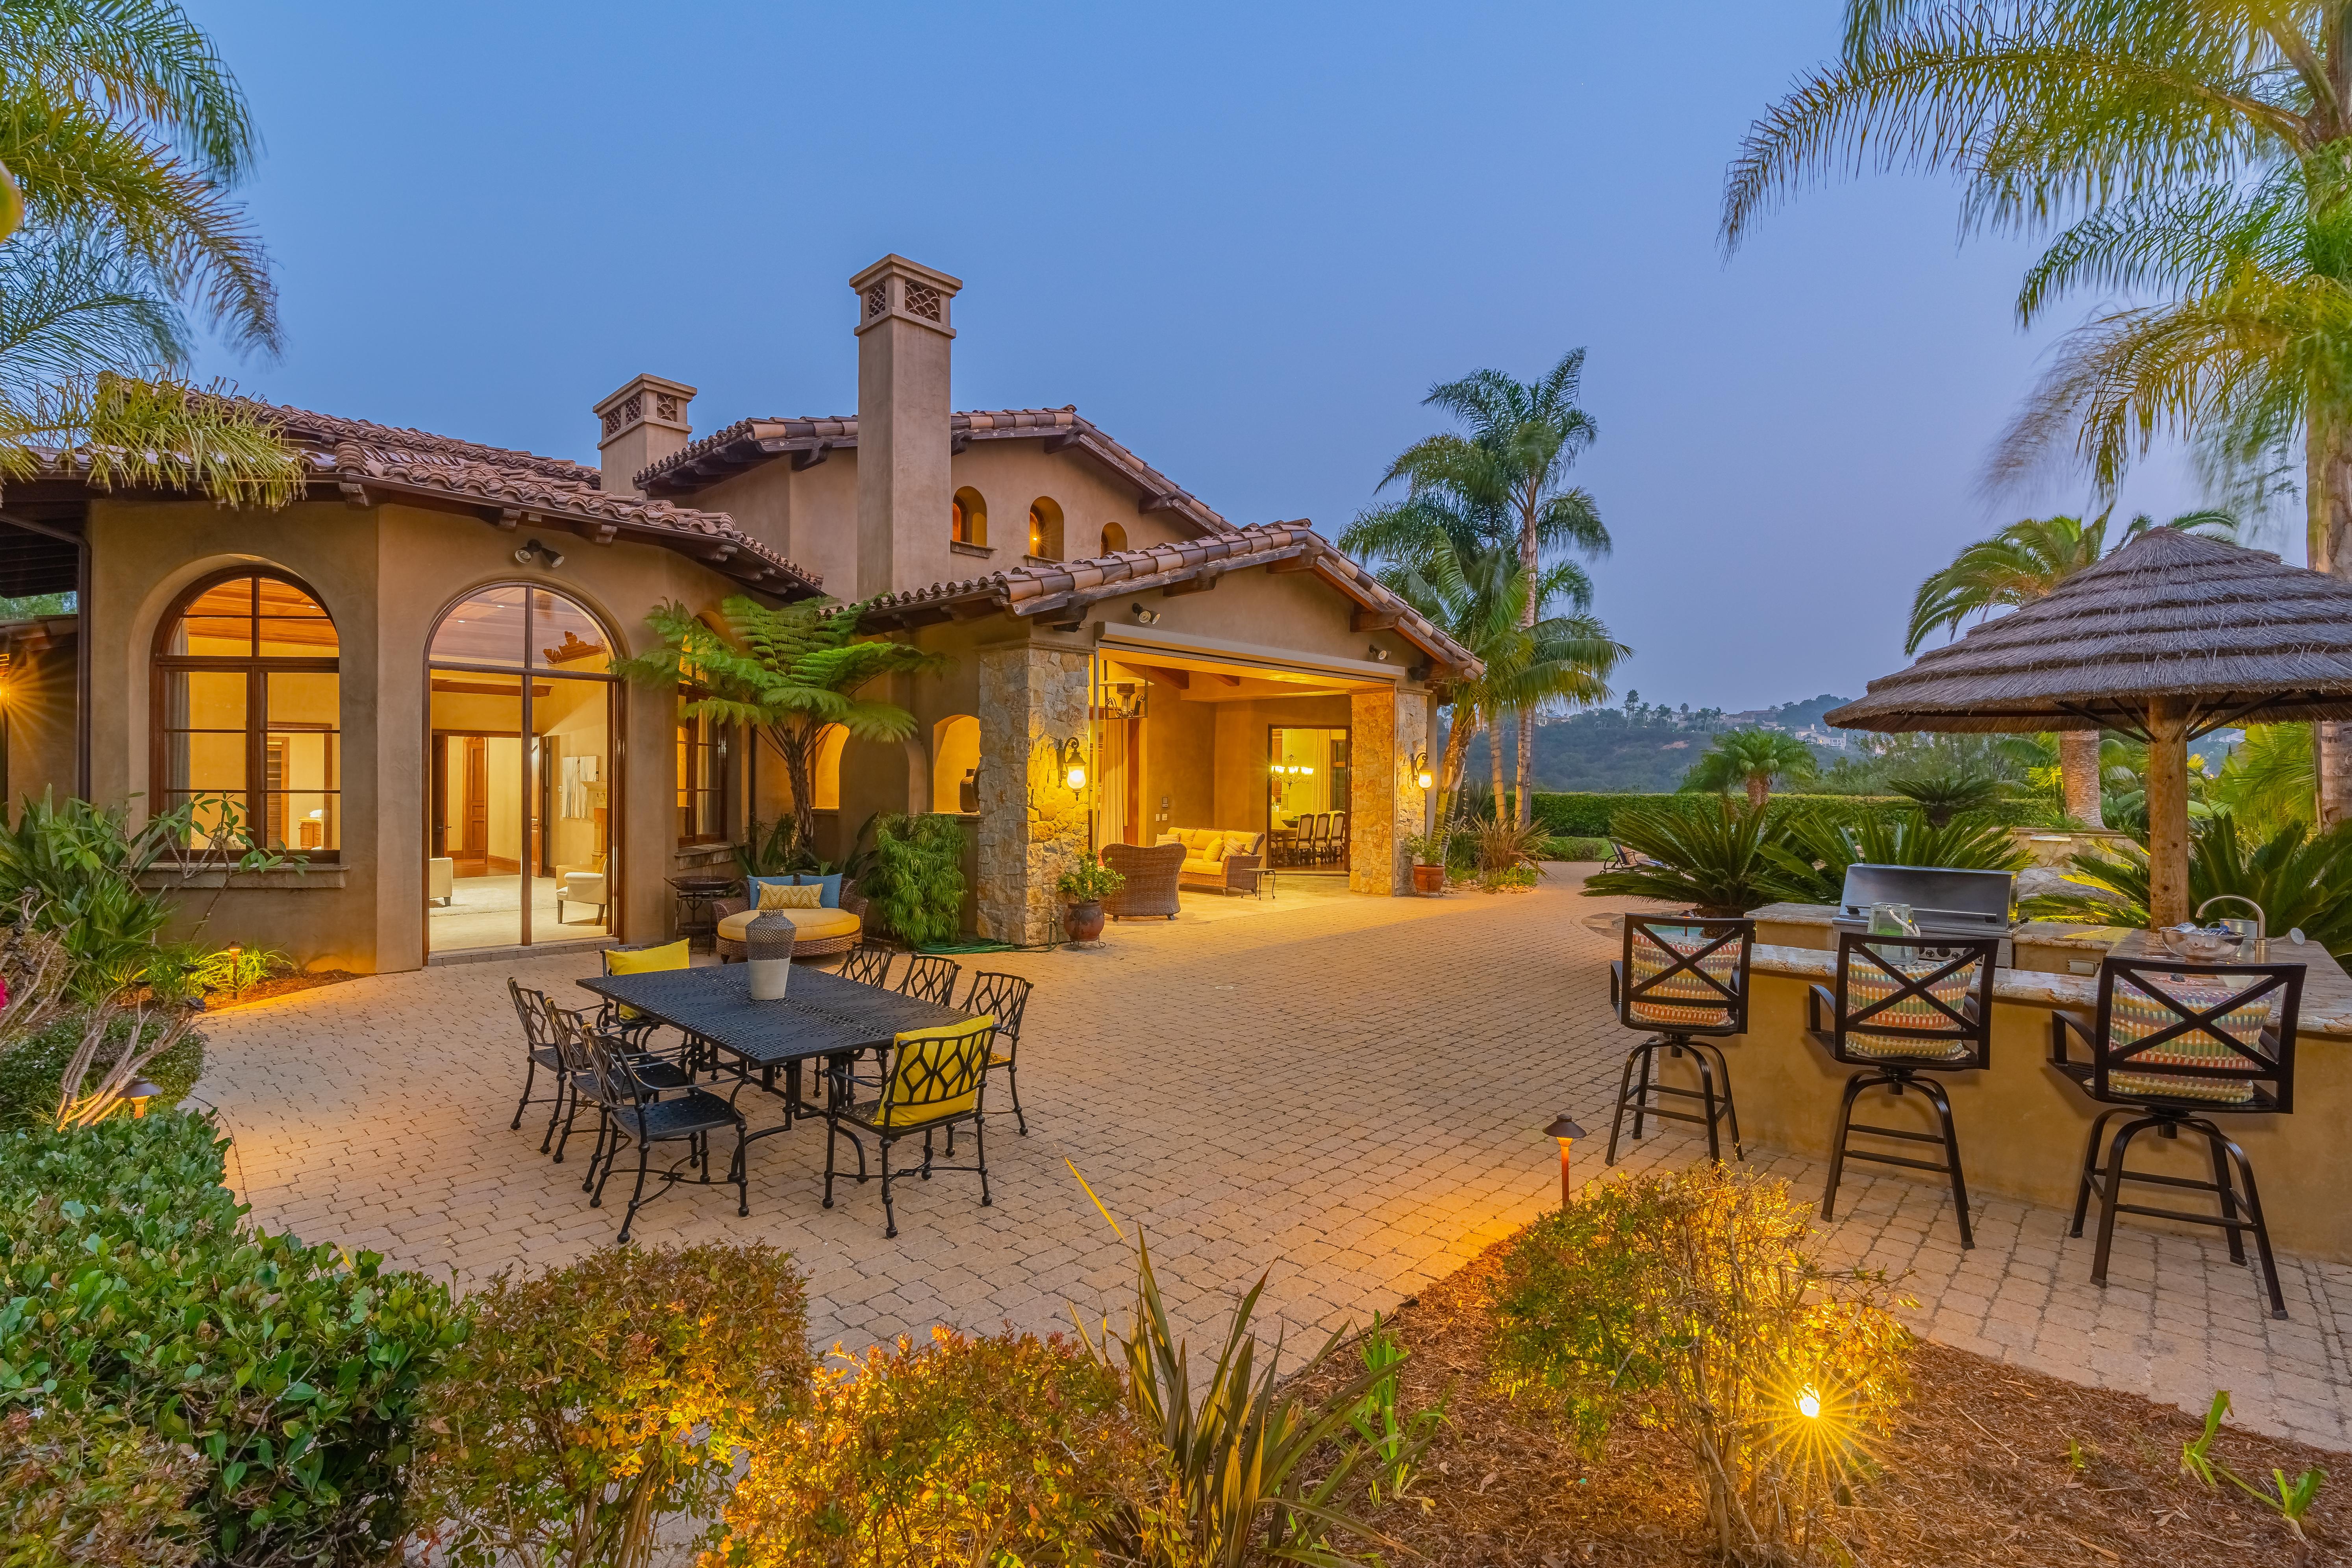 120_13840 Rancho Capistrano Bend_2020091